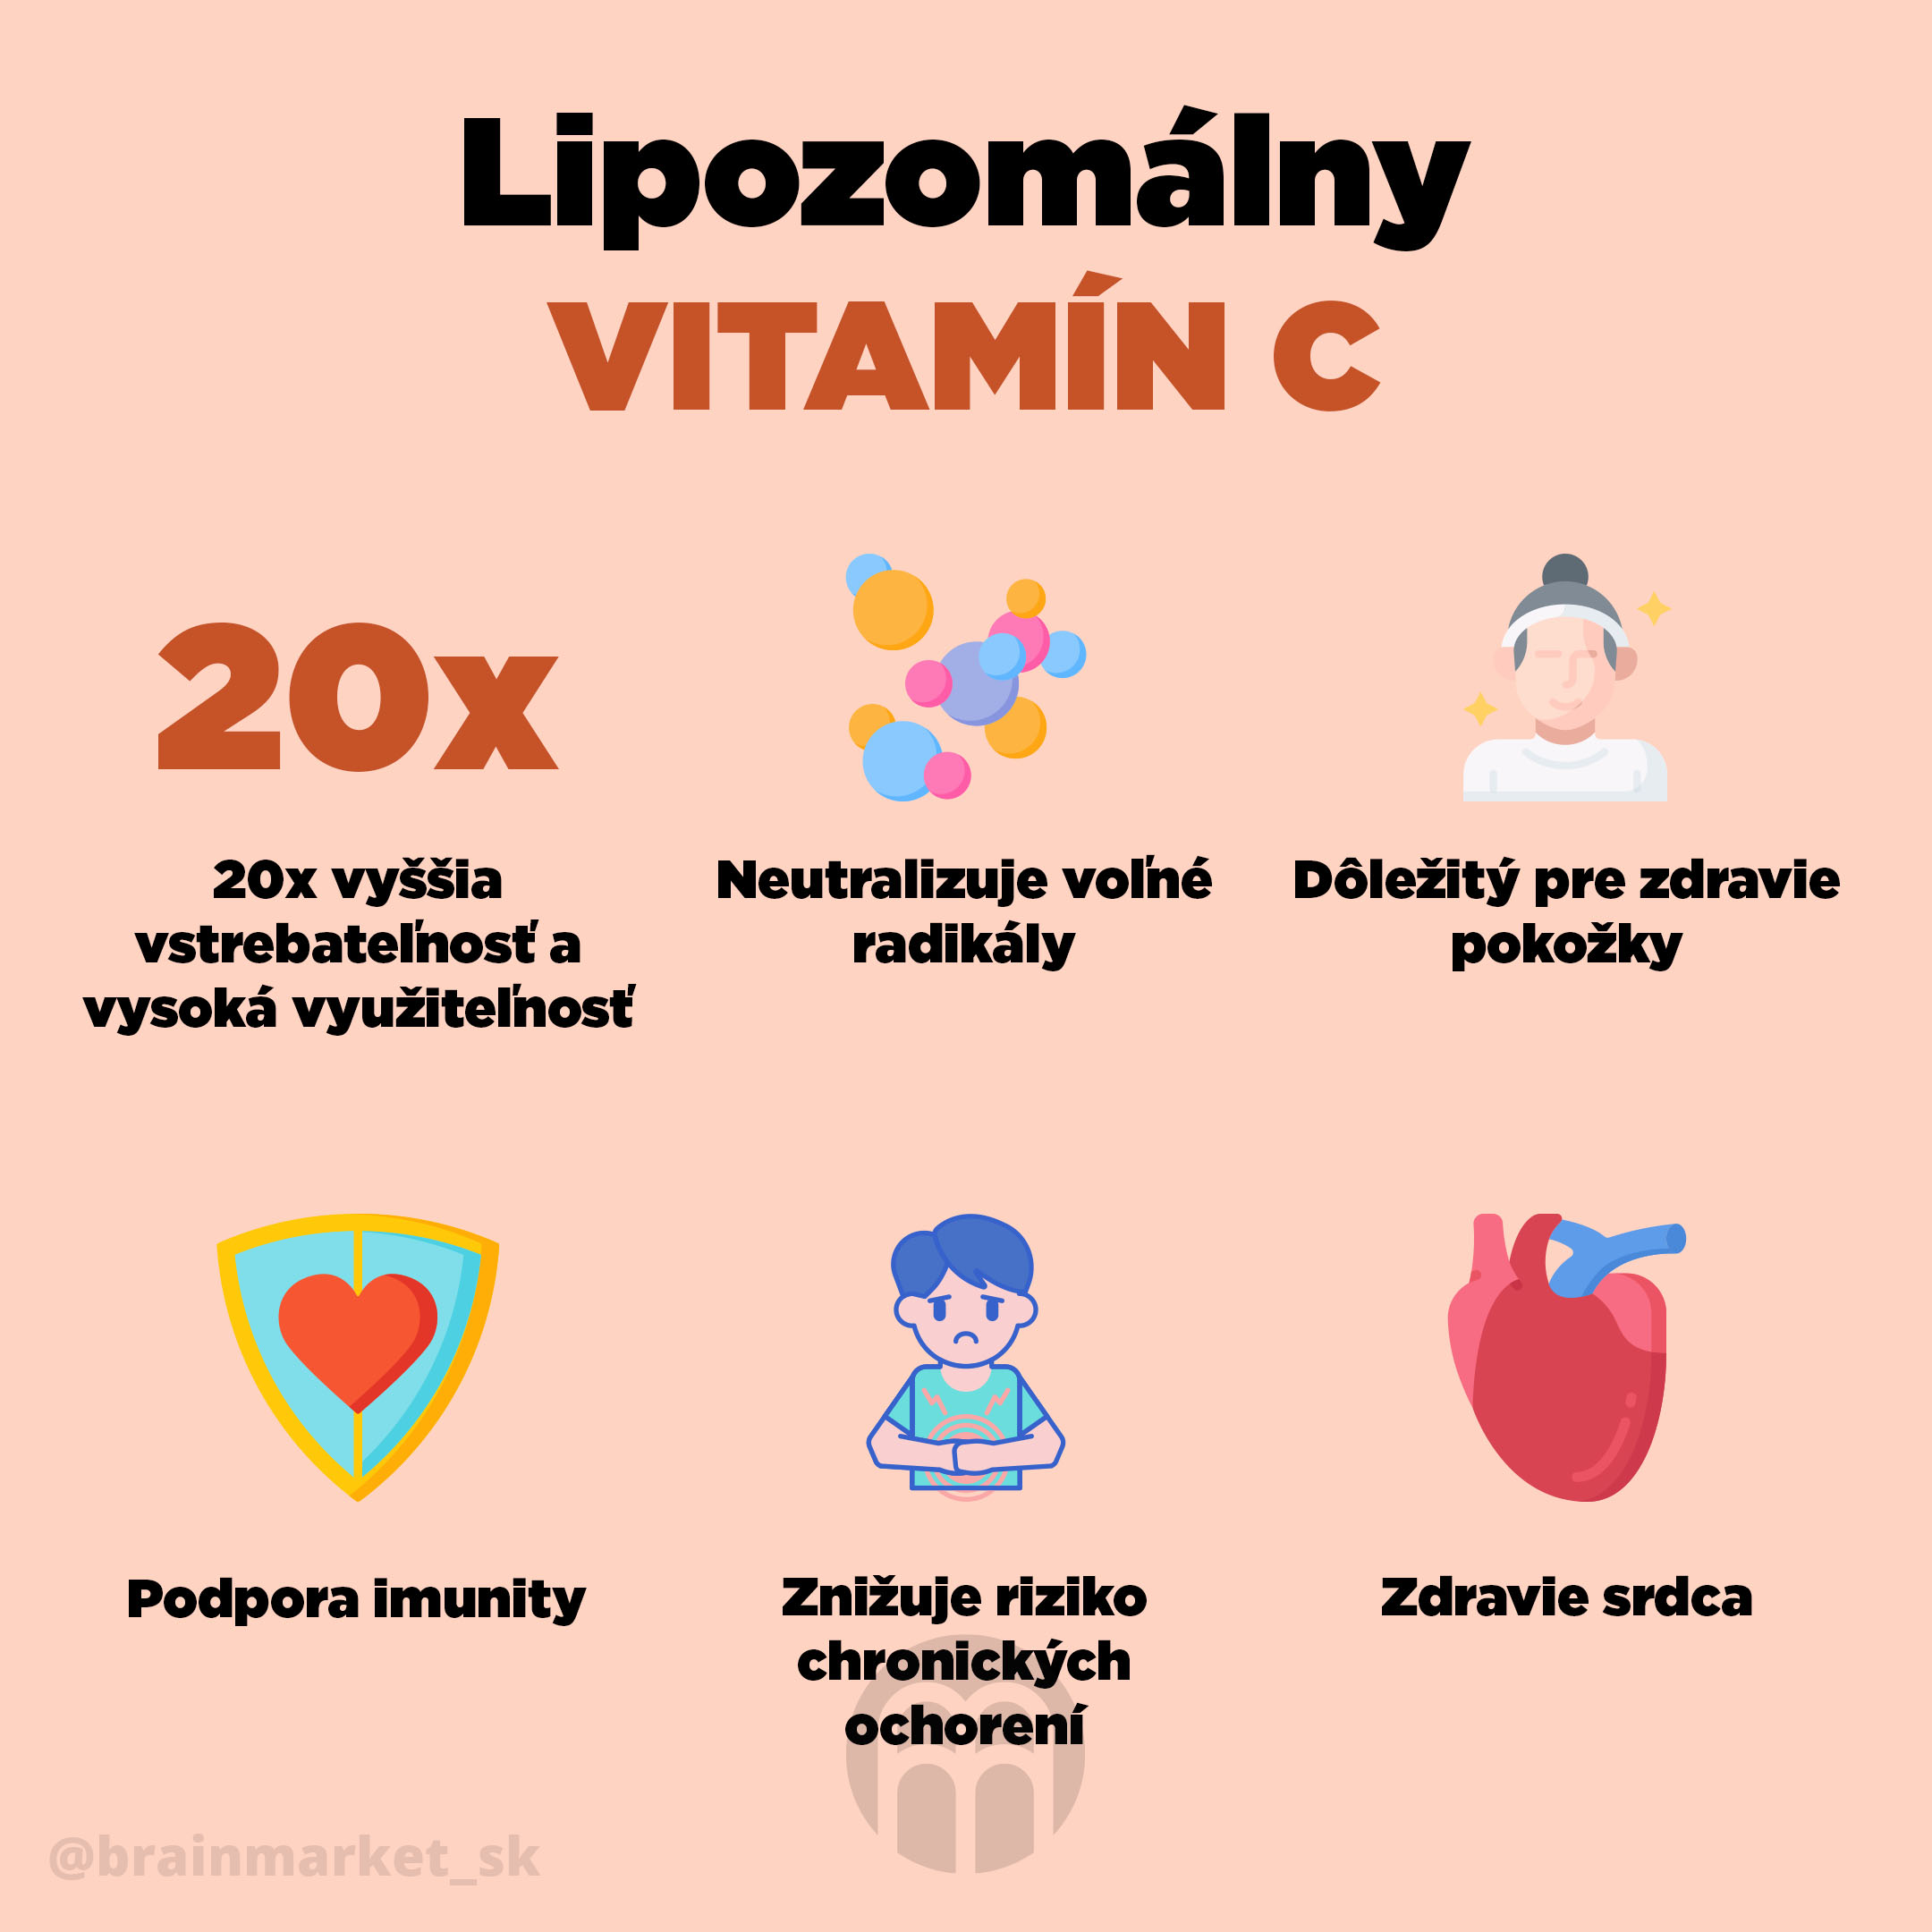 lipozomalny_vitamin_C_infografika_brainmarket_SK